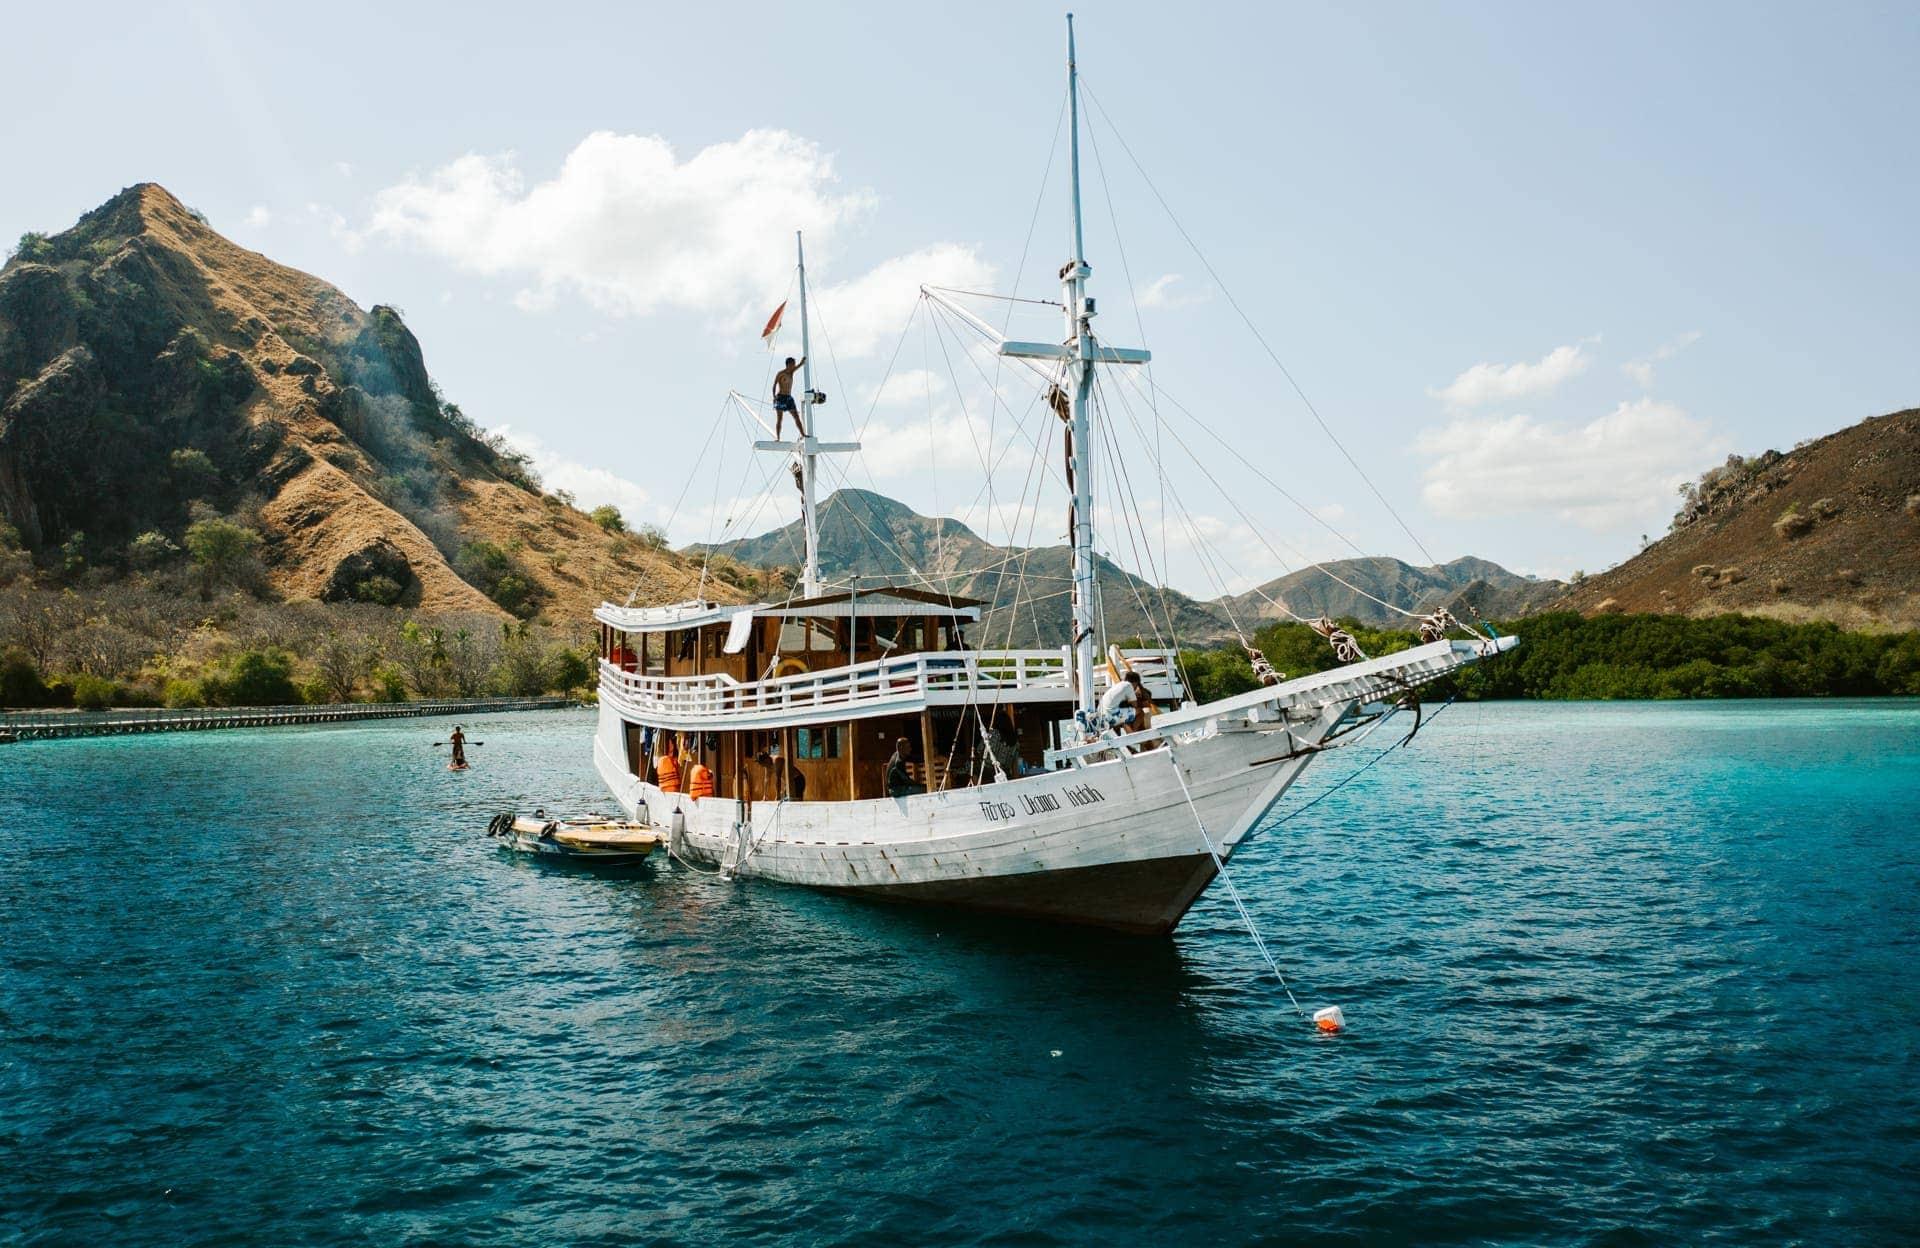 komodo islands boat tour